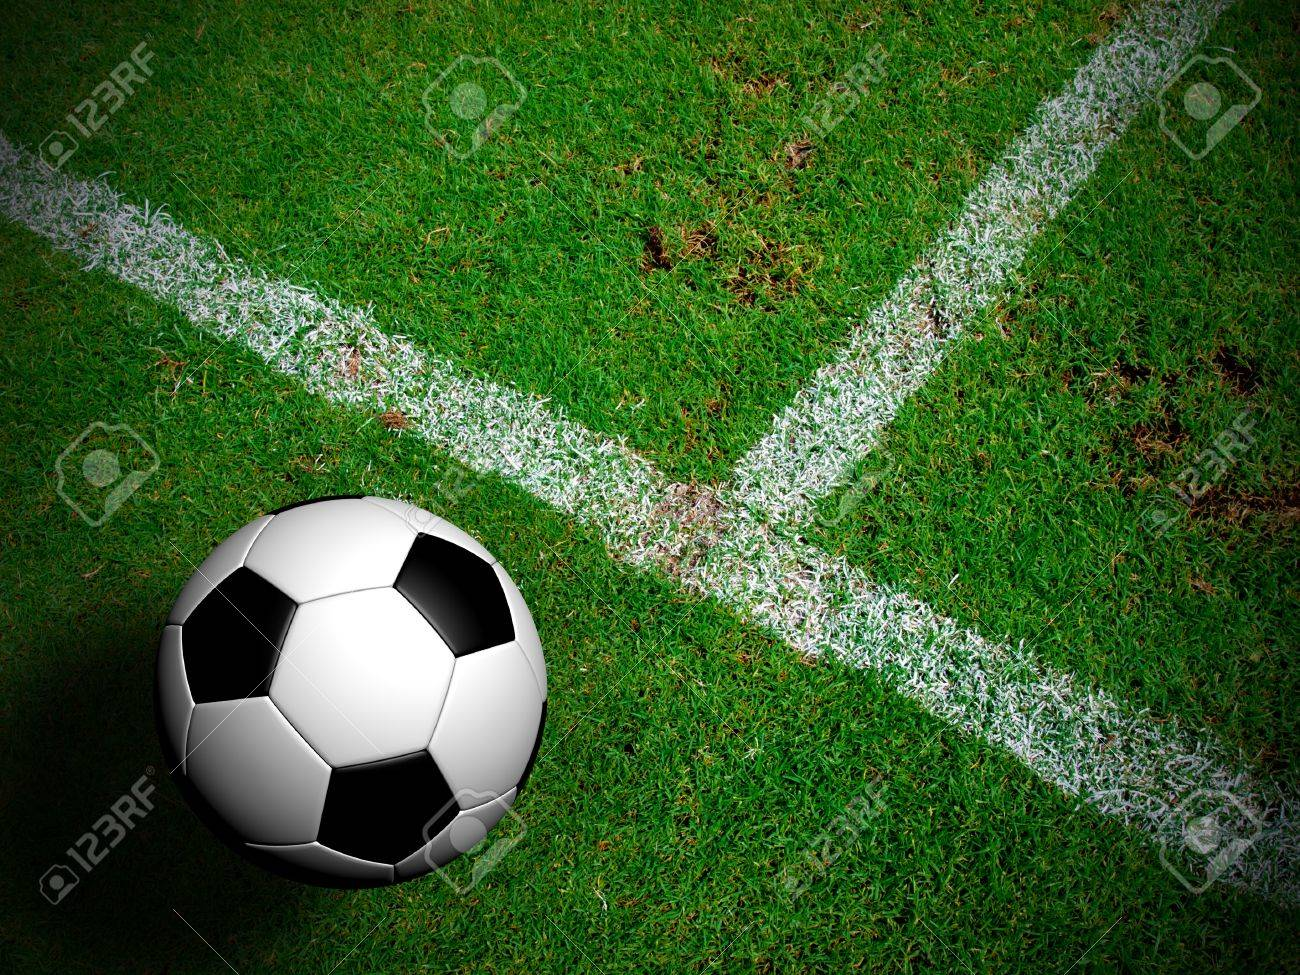 Football ( soccer ball ) in green grass field. Stock Photo - 14187628